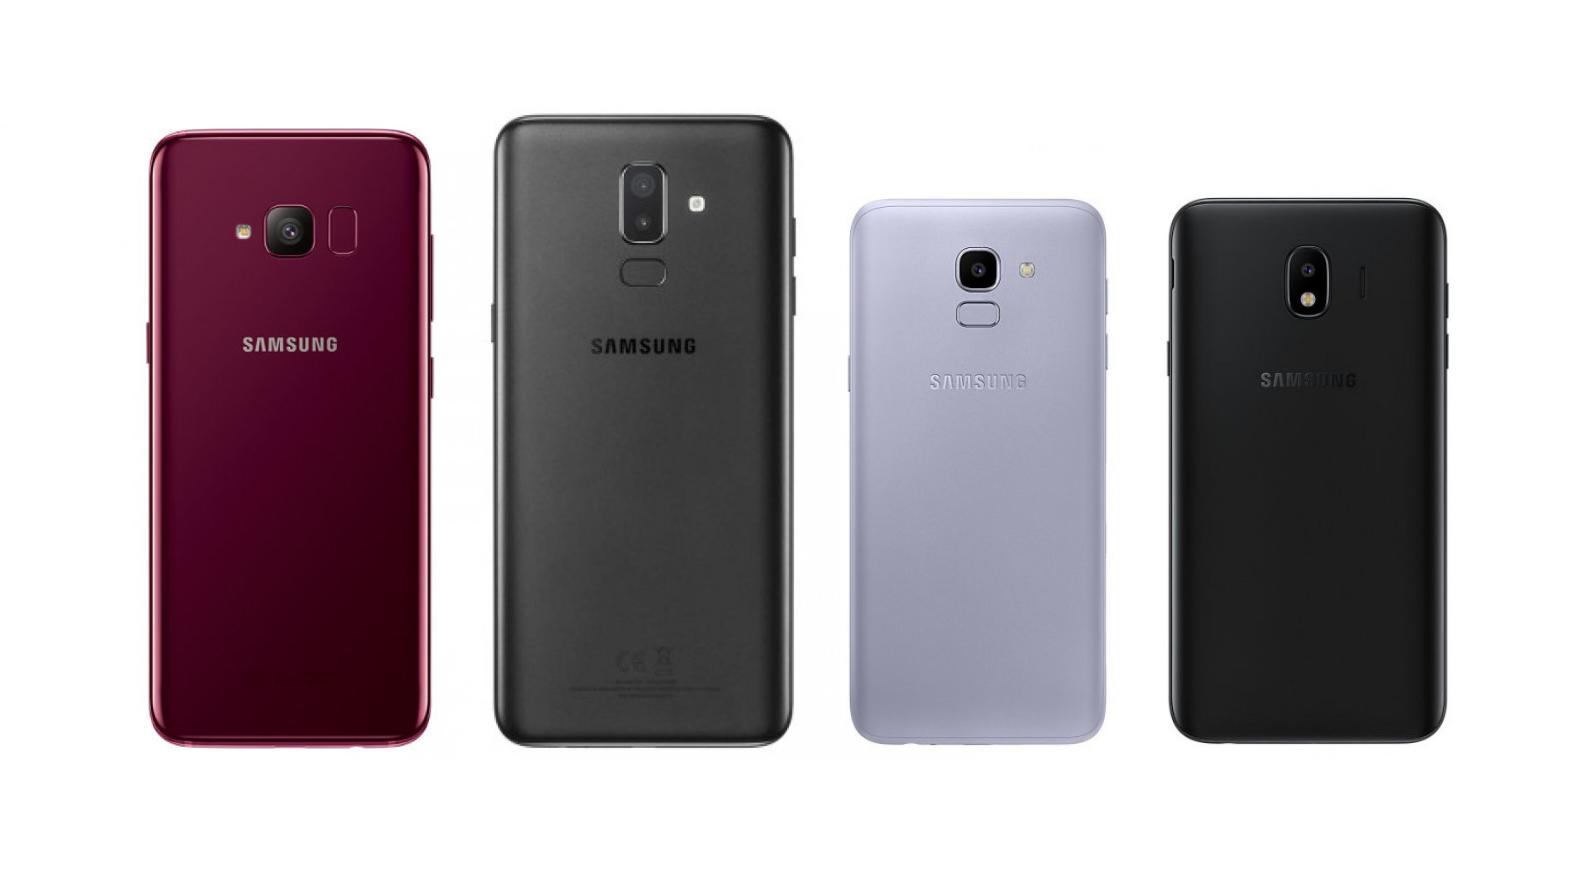 Samsung Galaxy S Light Luxury, Galaxy J8, Galaxy J6 And Galaxy J4 Revealed  Starting